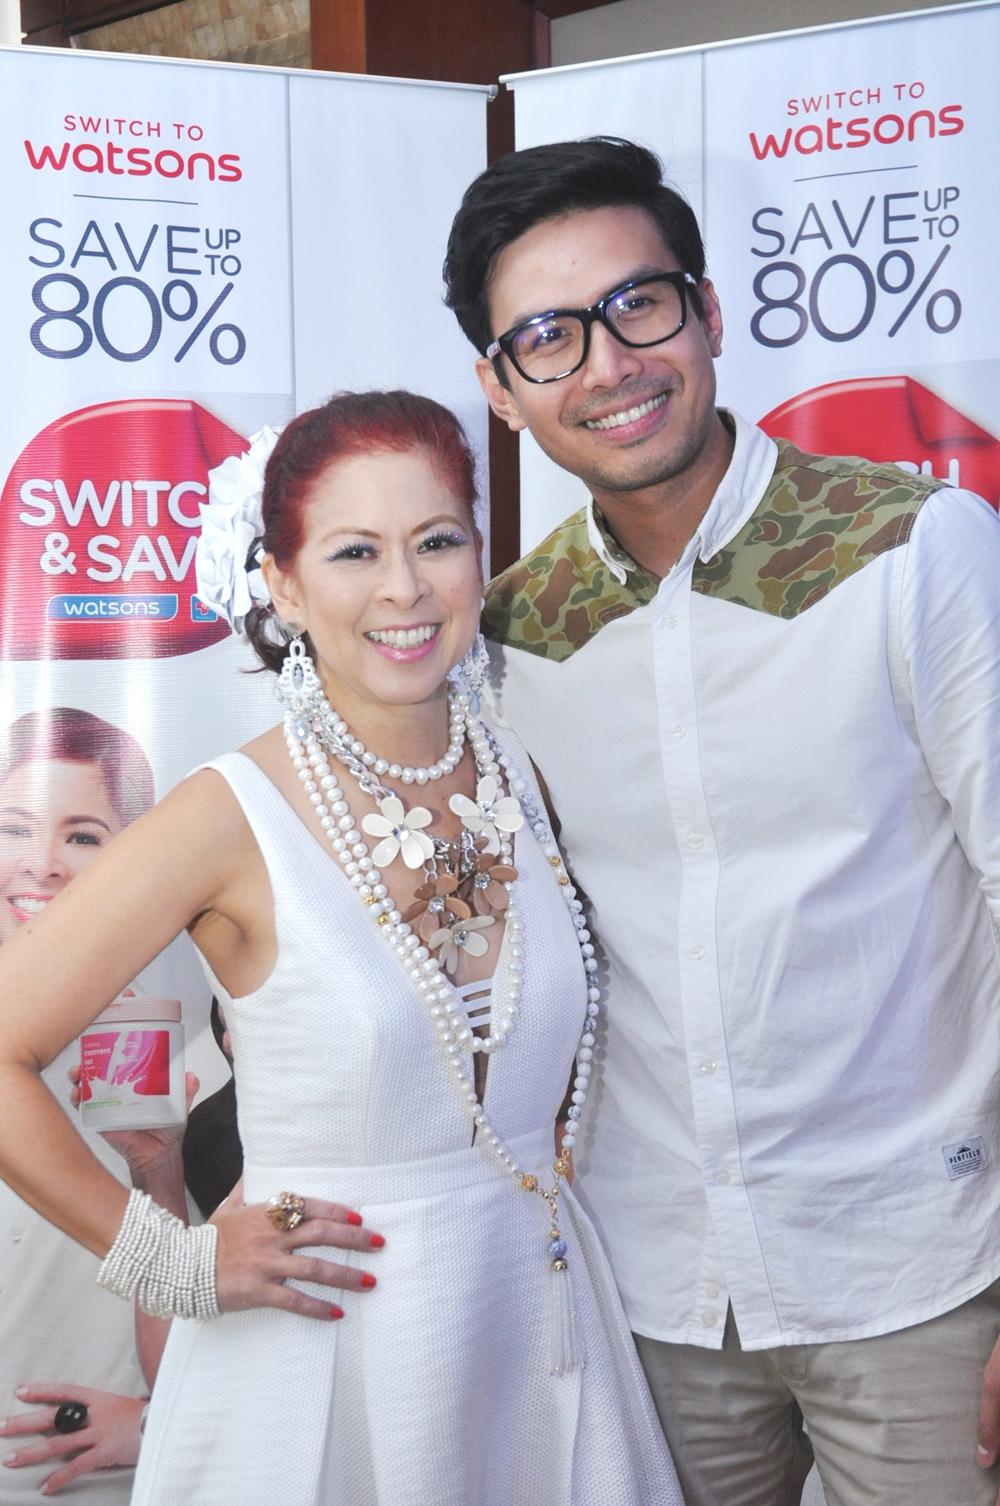 Watsons Brand Ambassadors Tessa Prieto-Valdez and Christian Bautista